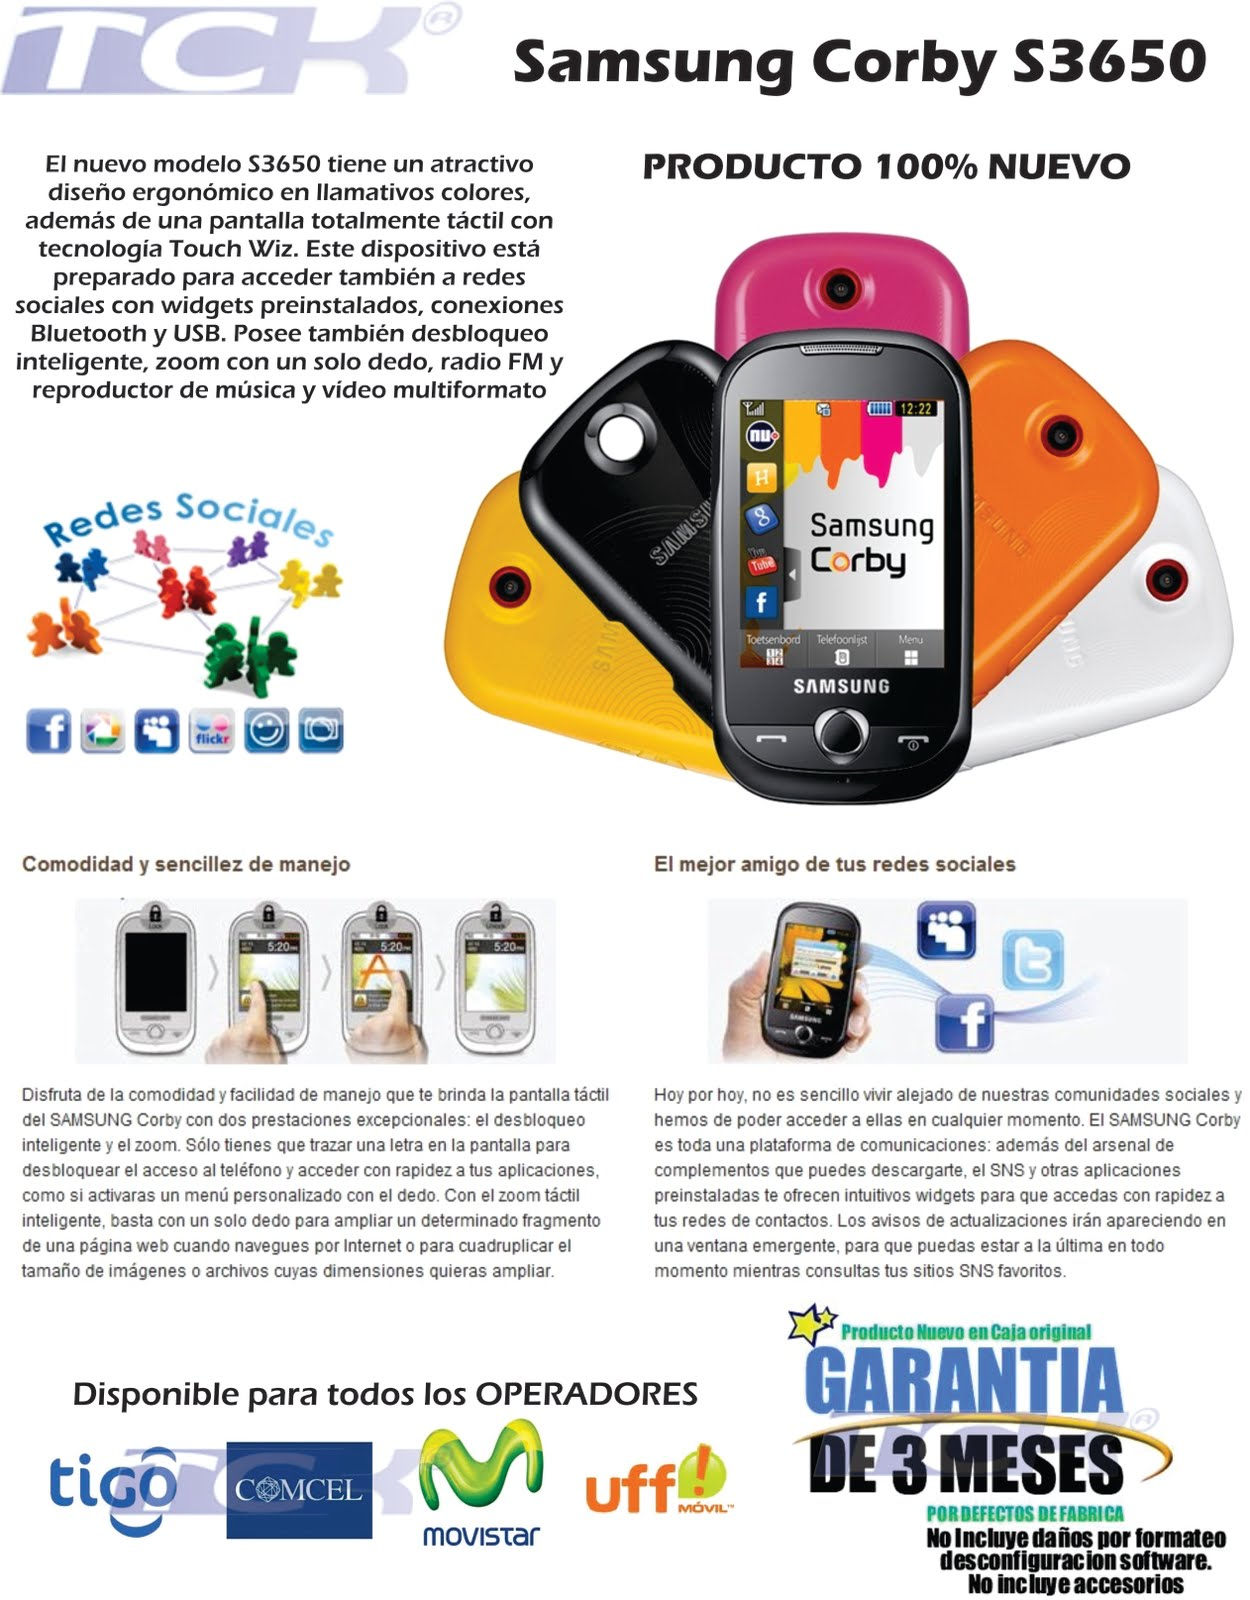 Soporte Tecnico TCK: Samsung Corby S3650